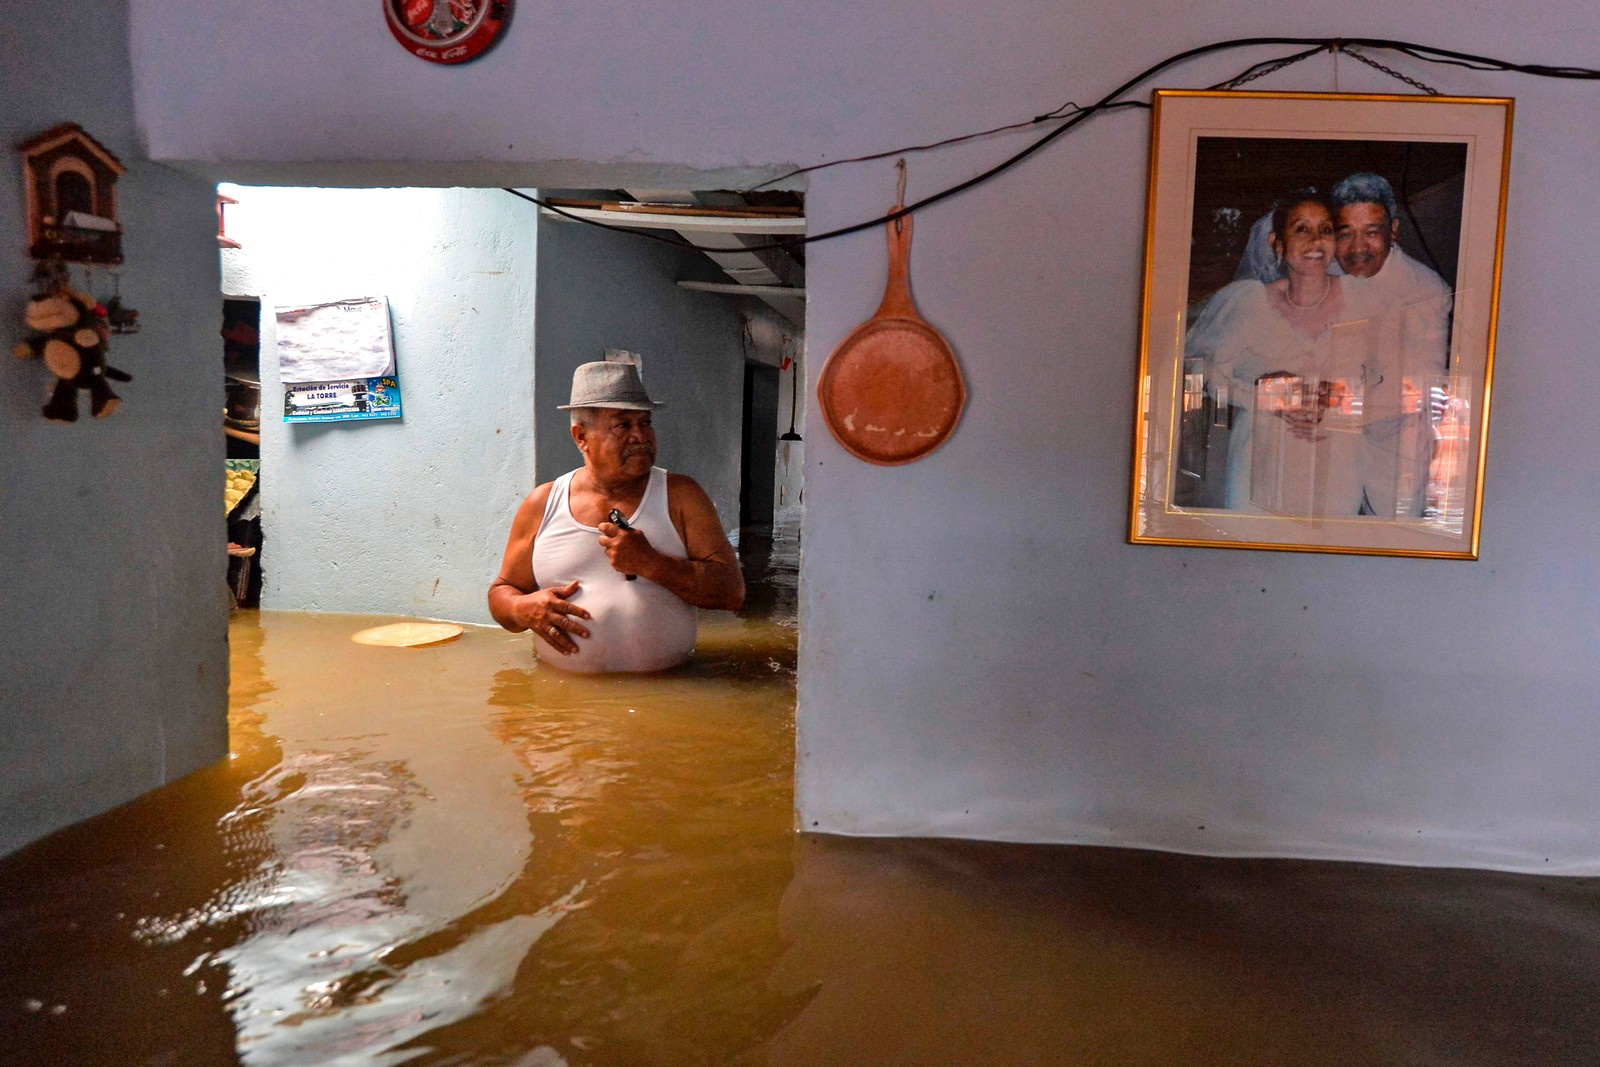 Regn har ført til at elven Cauca har flommet over i Cali i Colombia. Landet har slitt med flom siden mars.